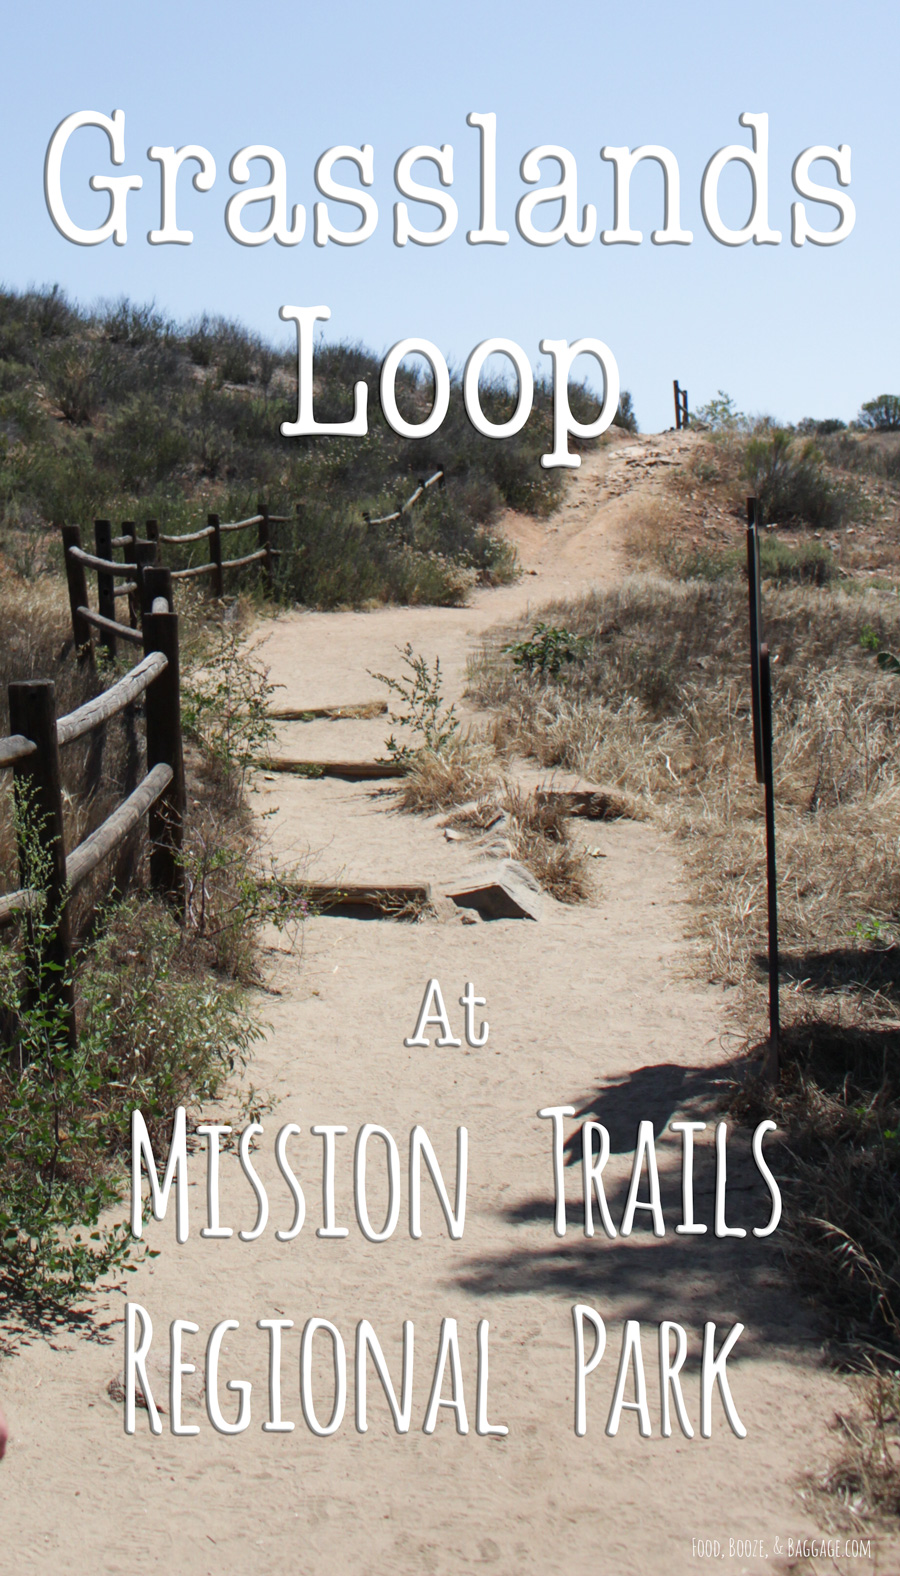 Grasslands-Loop-Trail-at-Mission-Trails-Regional-Park